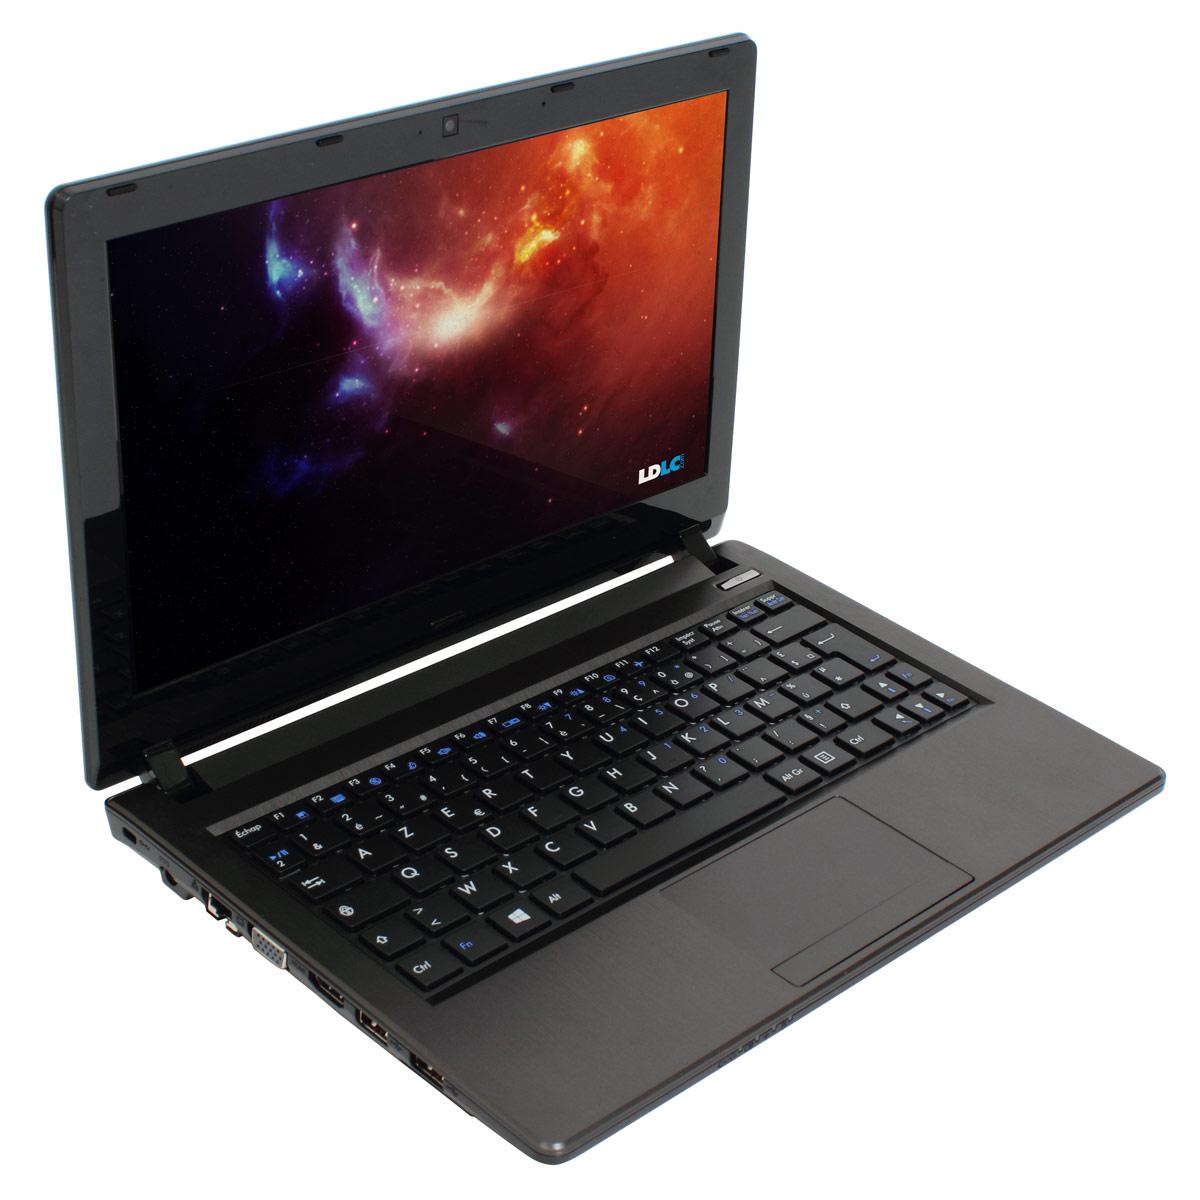 "PC portable LDLC Mercure ML1-C1-4-S1-H7 Intel Celeron 1037U 4 Go SSD 120 Go 11.6"" LED HD Wi-Fi N/Bluetooth Webcam Windows 7 Premium 64 bits"